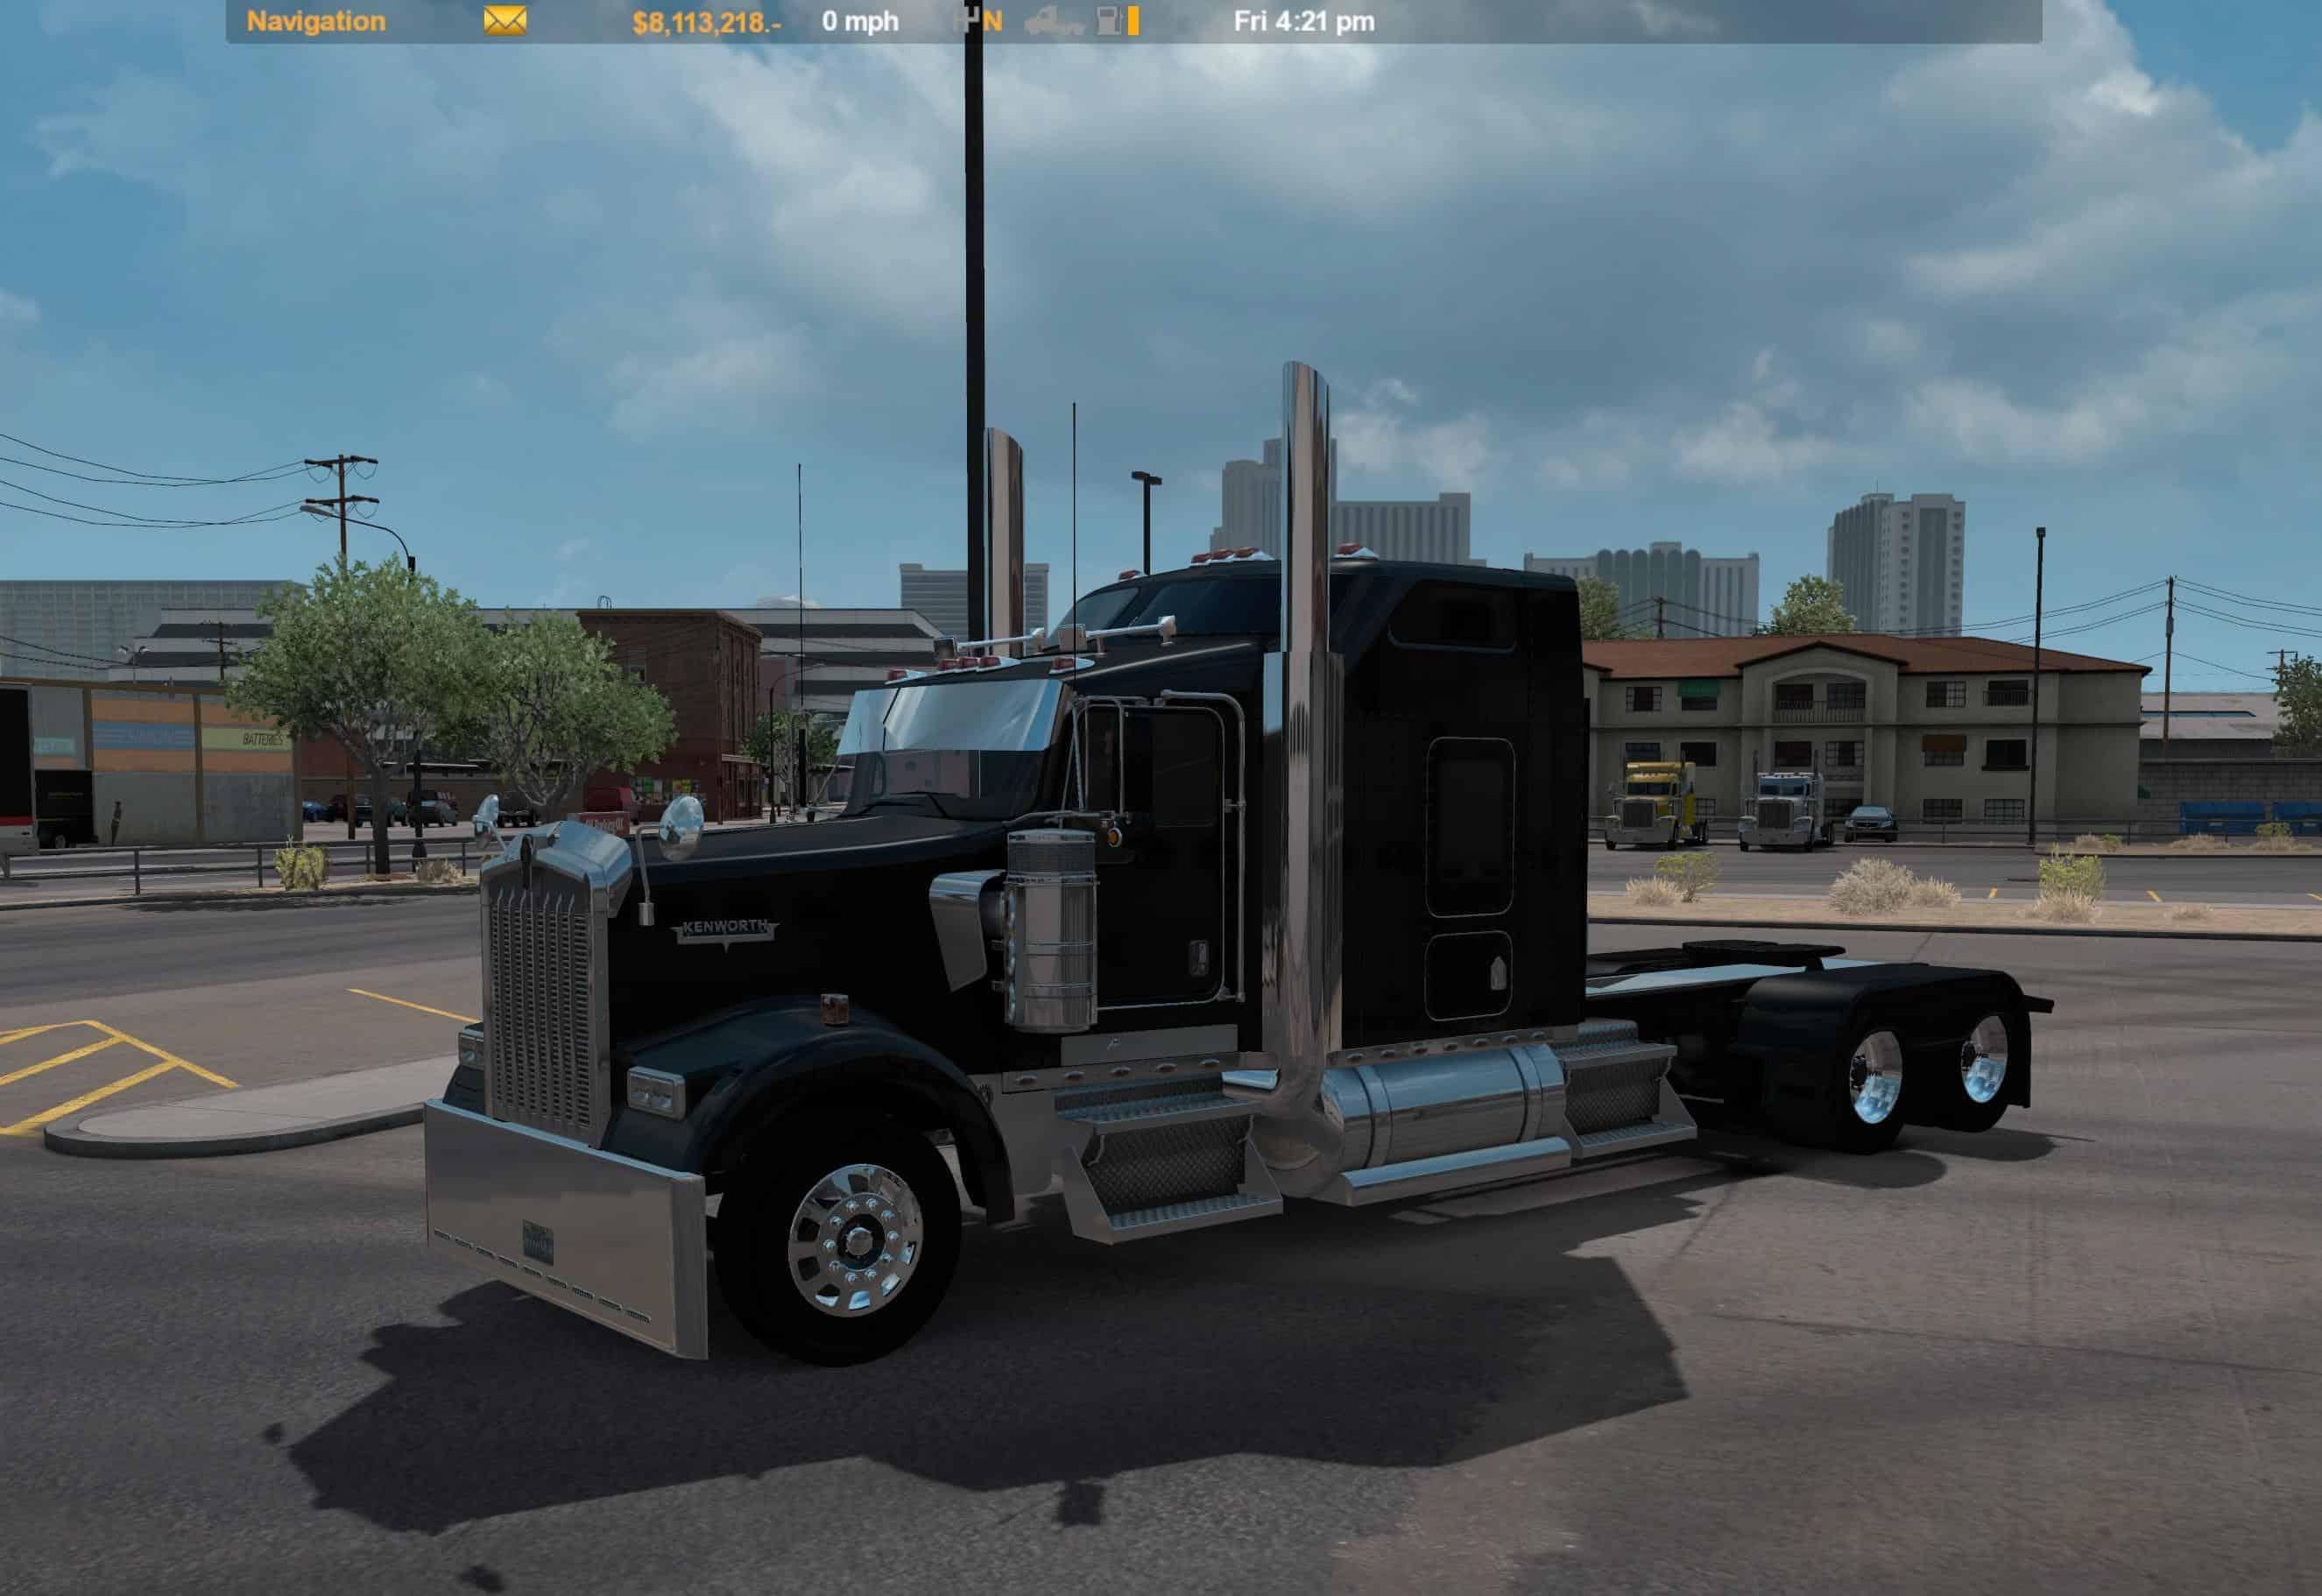 Scs w900 add-on 1 35 Mod - ATS Mod | American Truck